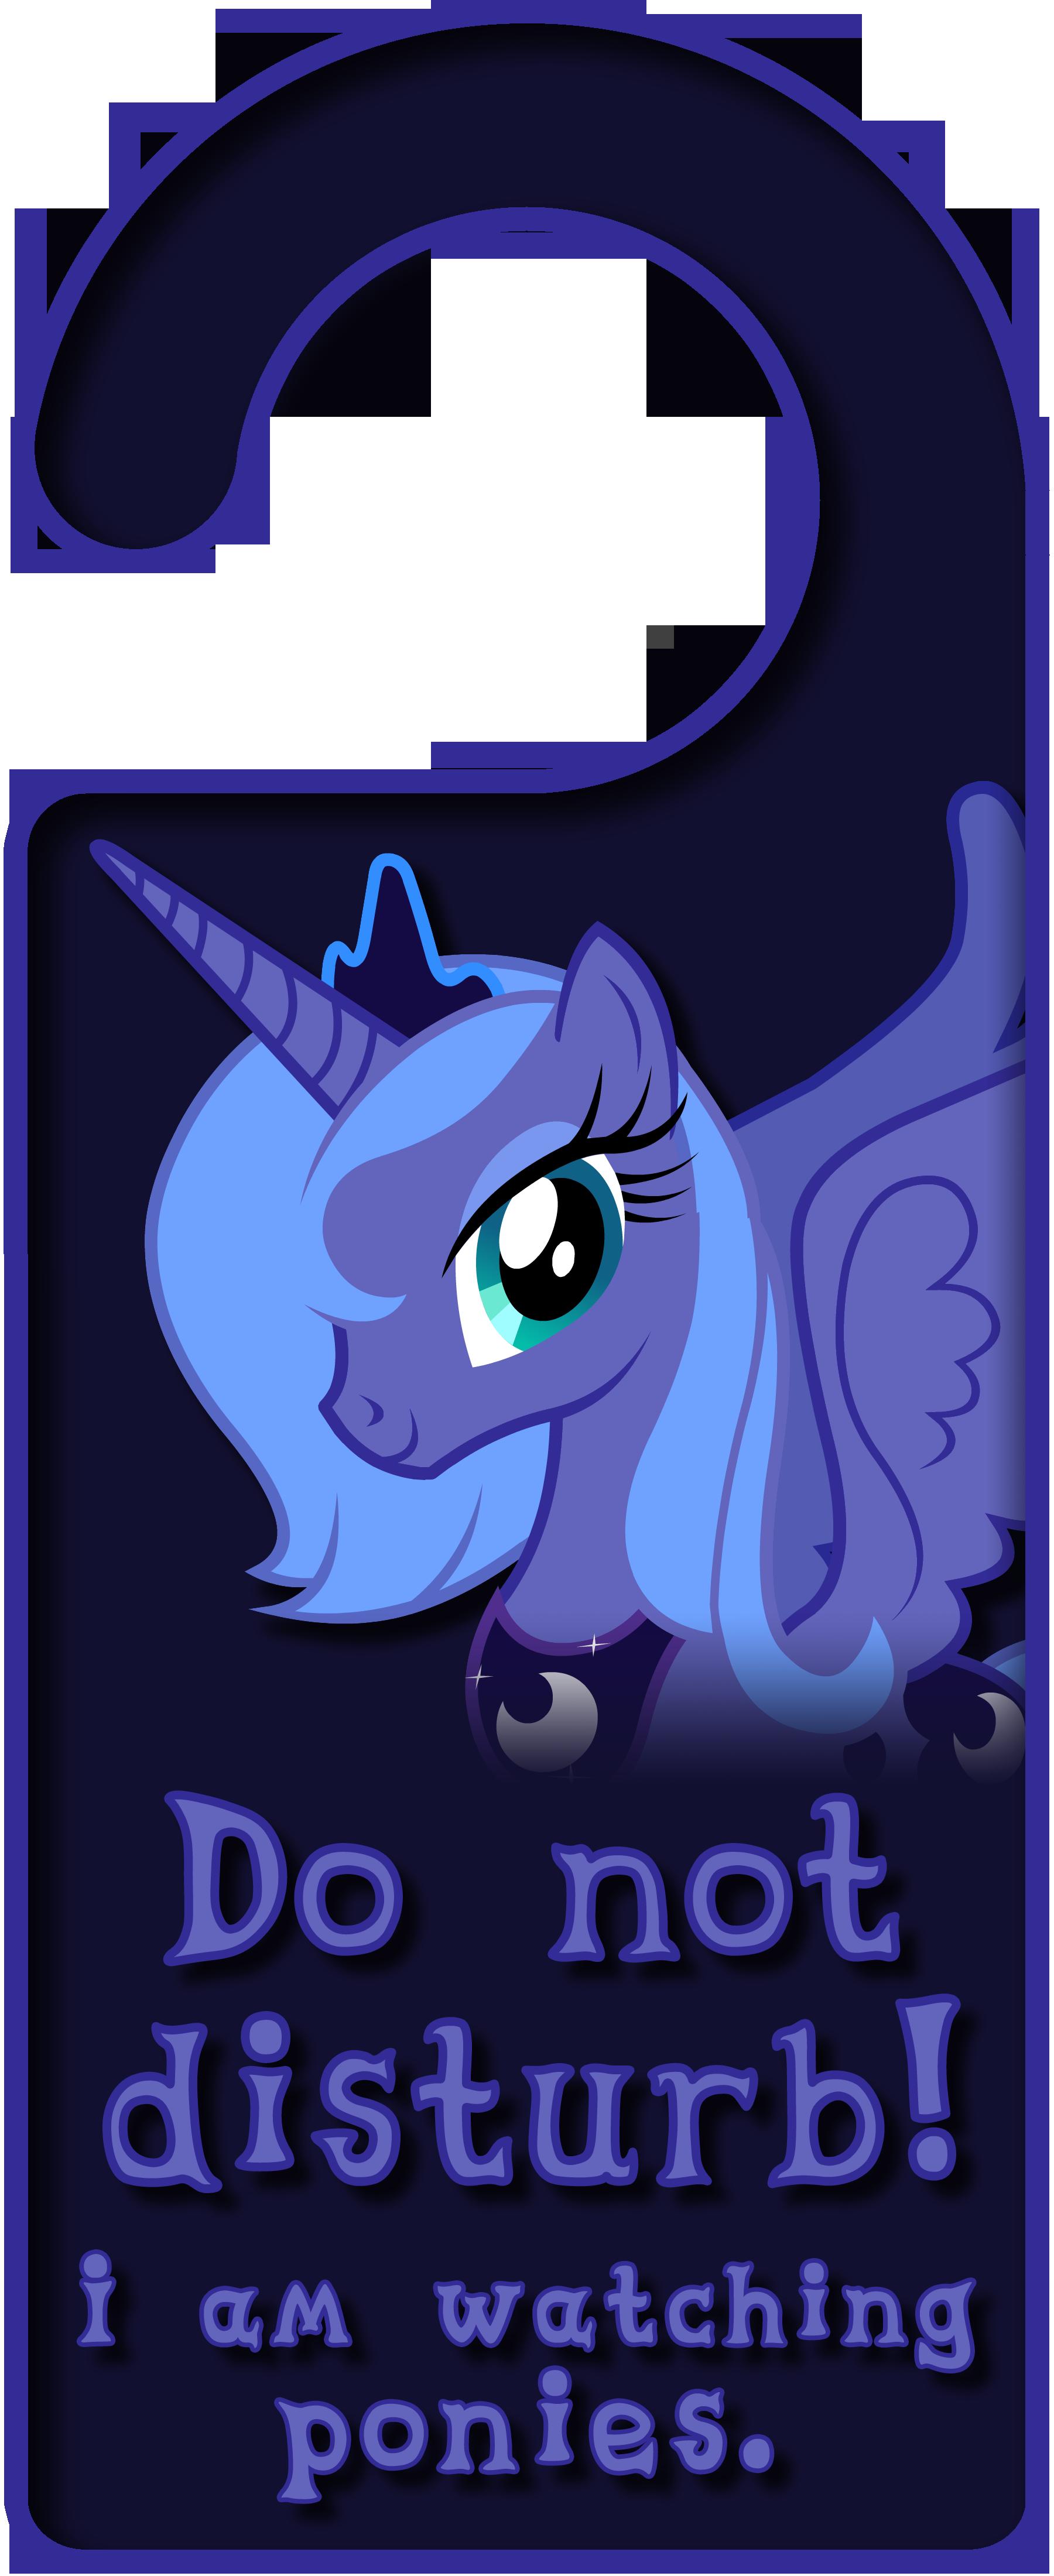 ... Season 1 Princess Luna Door Knob Hanger by Thorinair & Season 1 Princess Luna Door Knob Hanger by Thorinair on DeviantArt